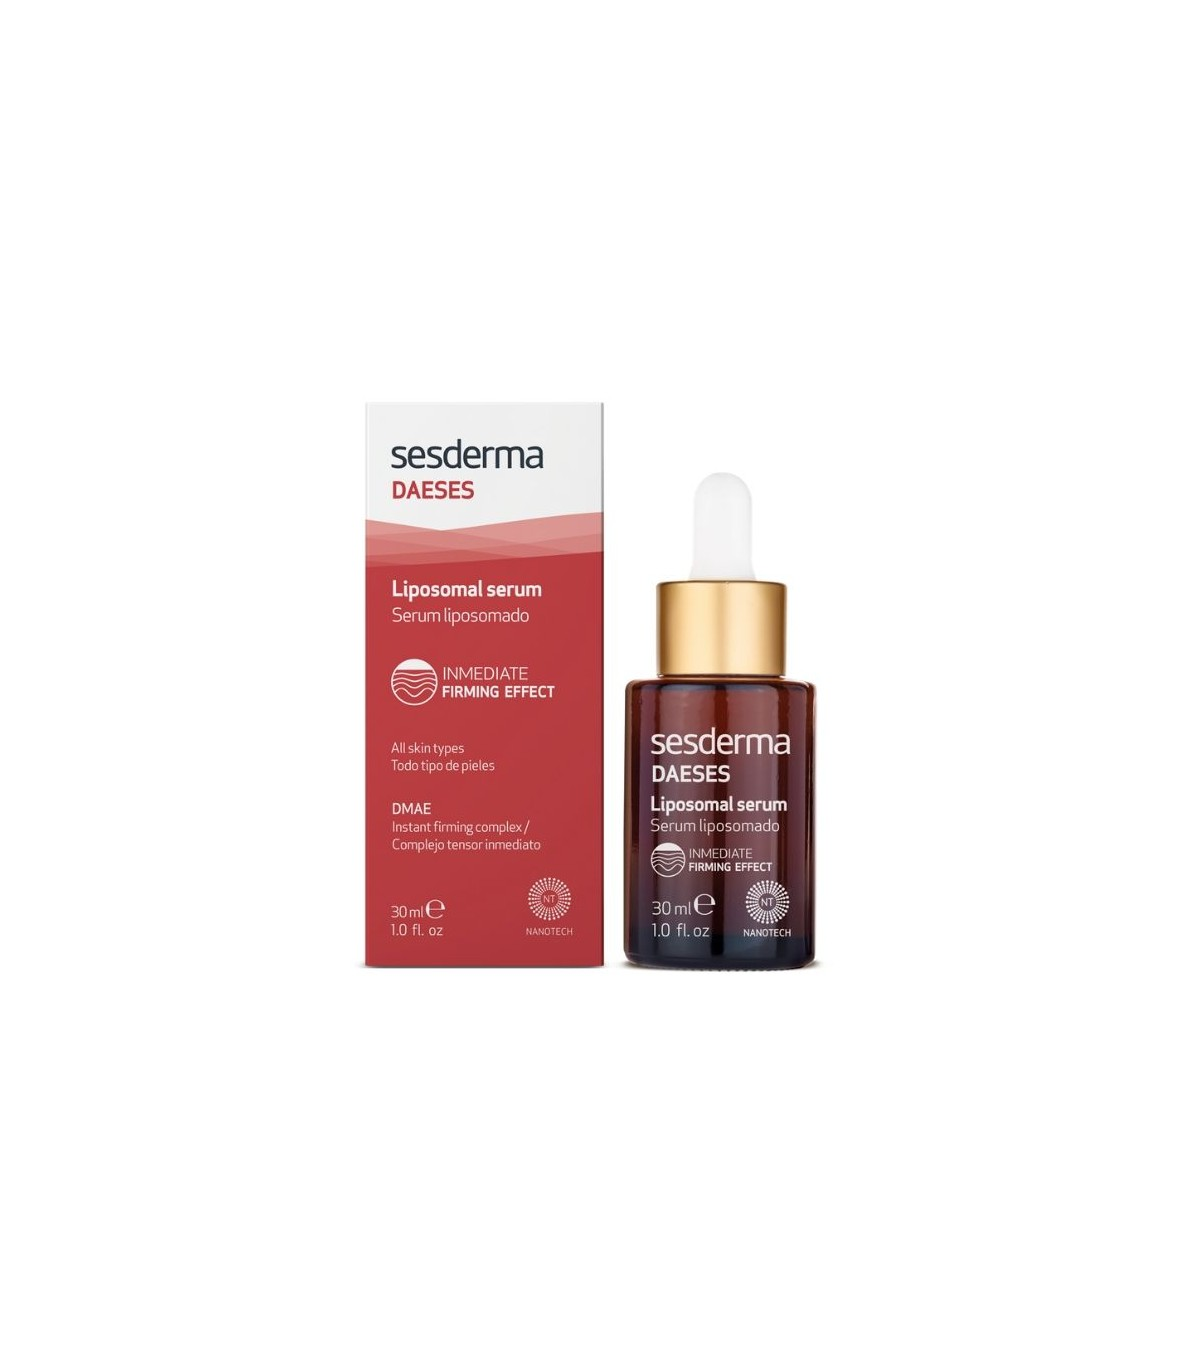 Farmacia Baricentro|SESDERMA DAESES LIPOSOMAL SERUM 30 ML